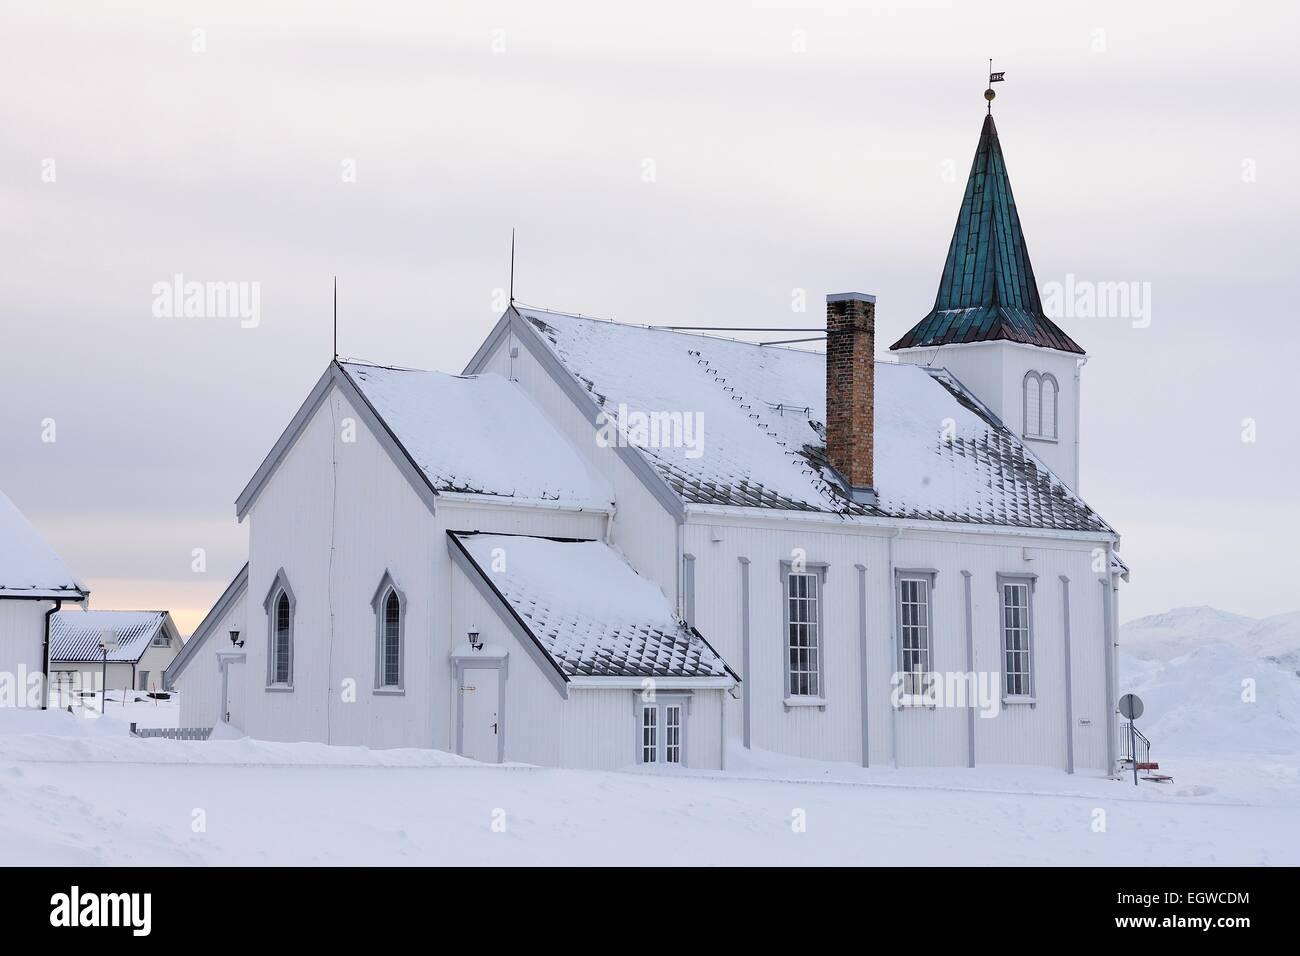 Snowy church, Honningsvåg, Magerøya, Nordkapp, Finnmark County, Norway - Stock Image